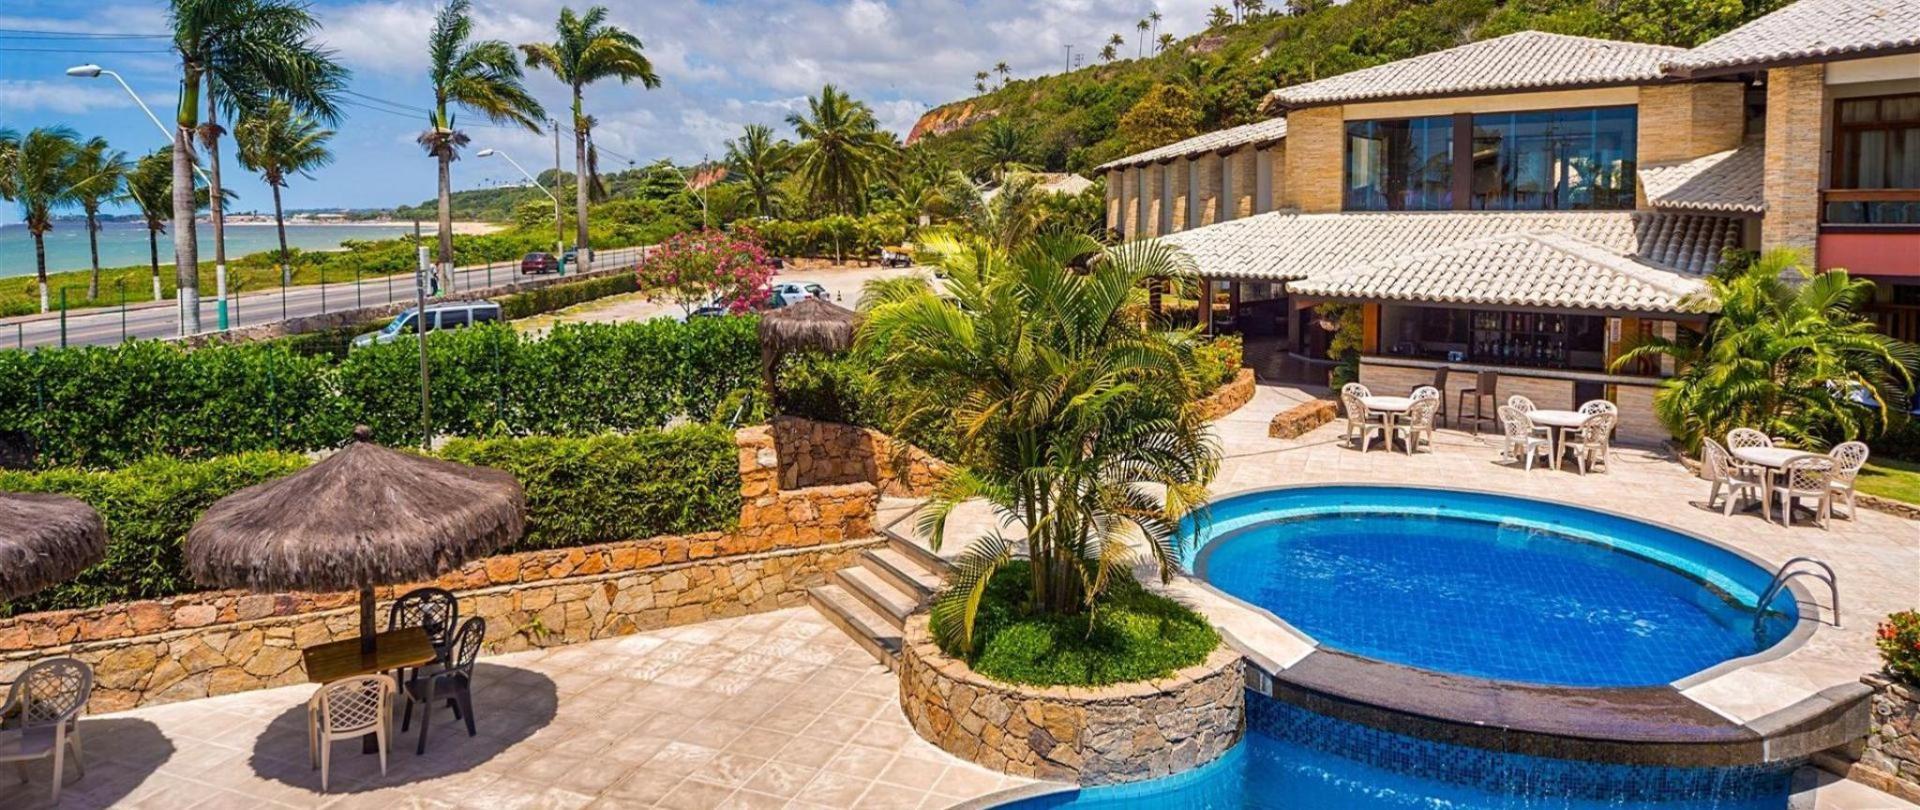 Quinta do Sol Hotel_Porto Seguro_Bahia (5).jpg